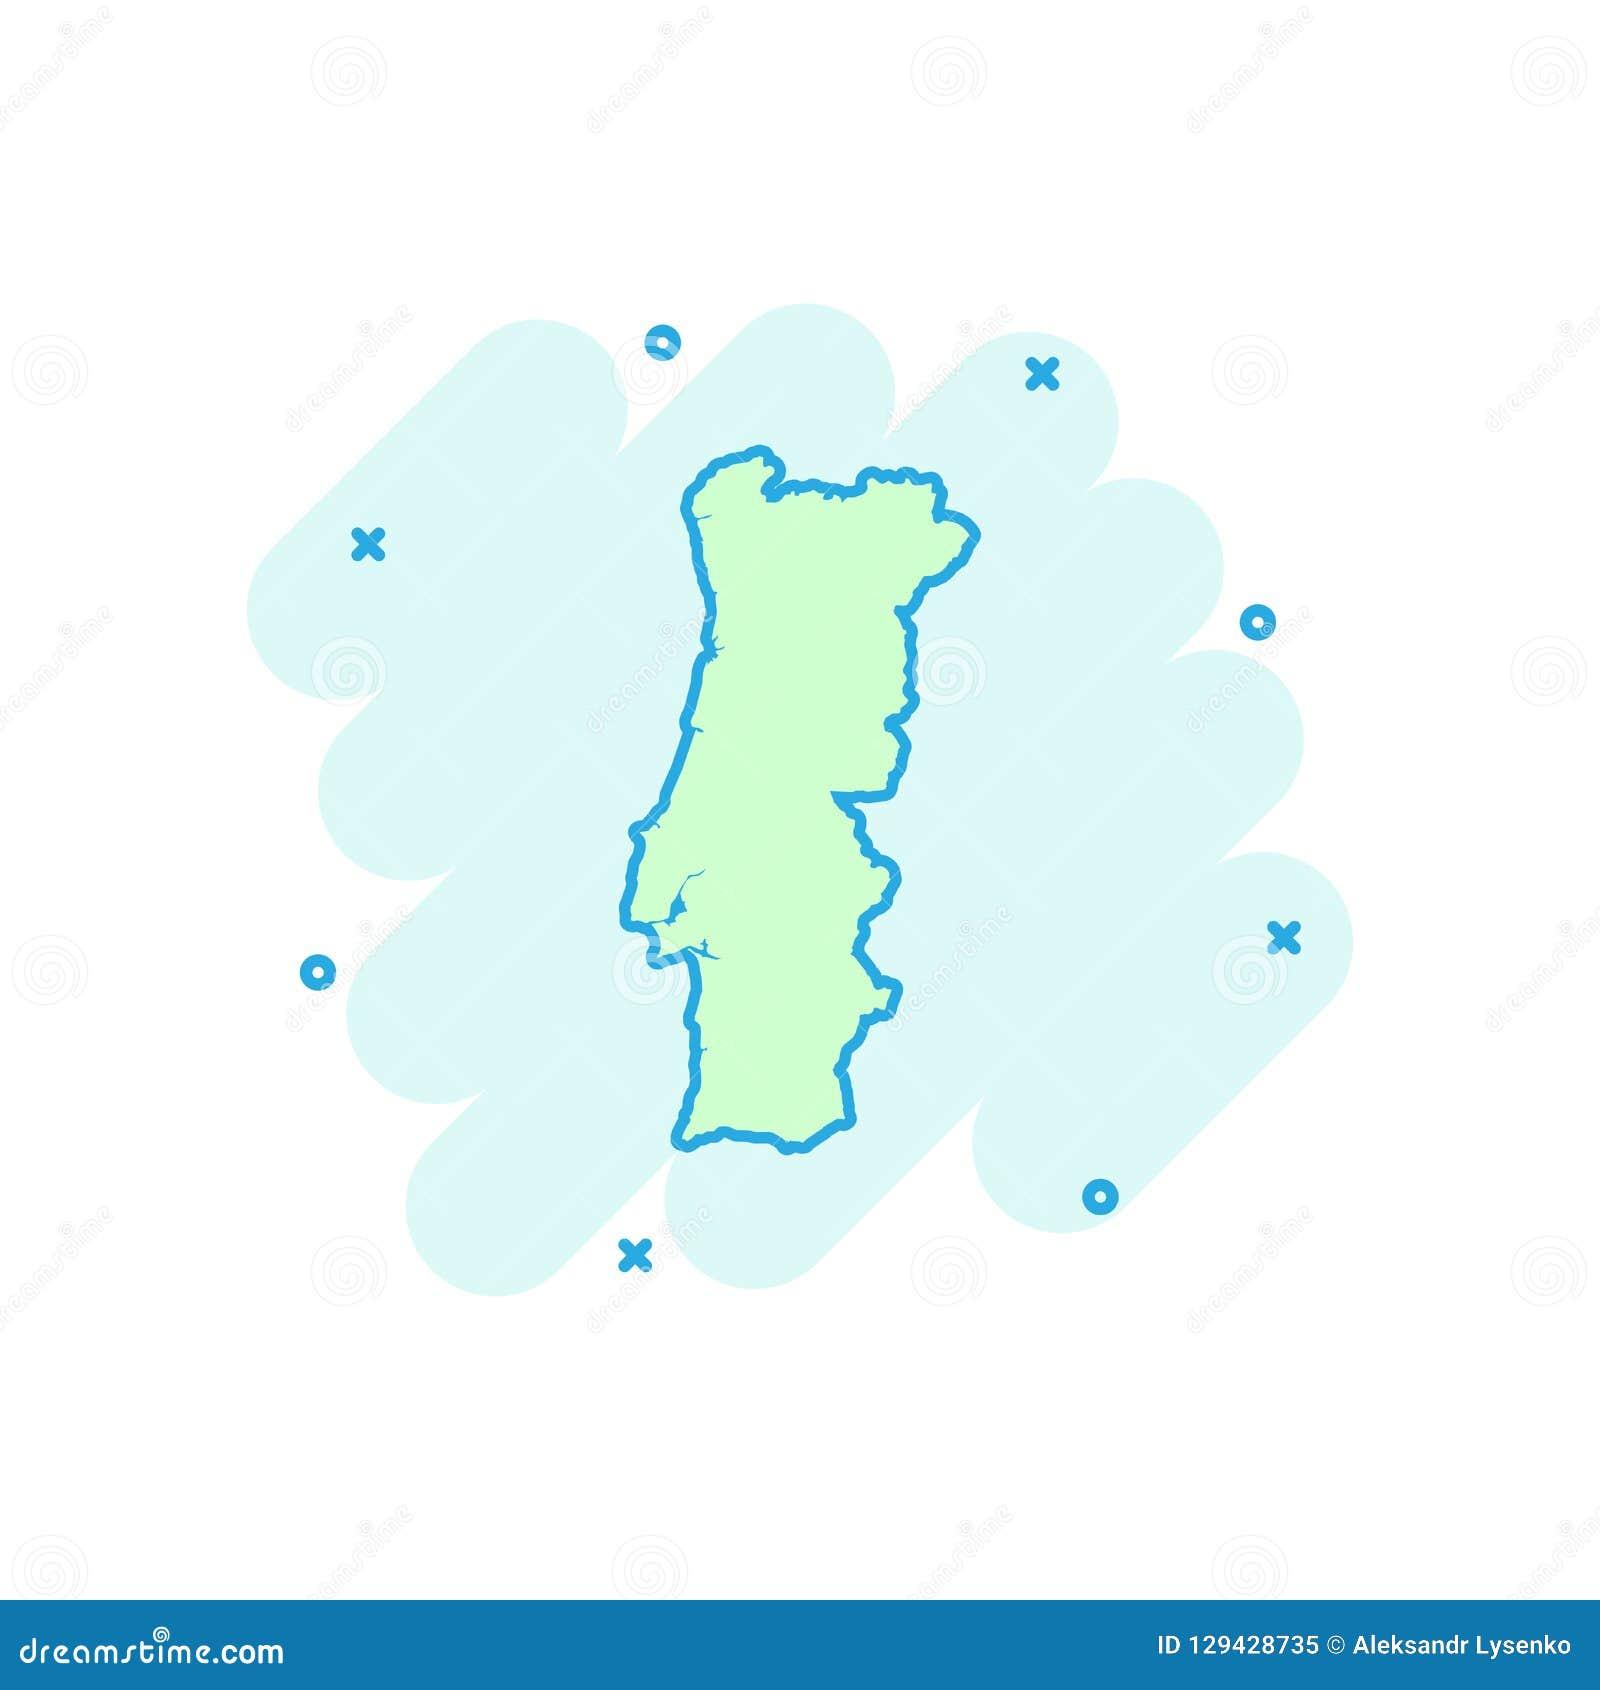 Vector O Icone Do Mapa De Portugal Dos Desenhos Animados No Estilo Comico Sinal De Portugal Mim Ilustracao Do Vetor Ilustracao De Desenhos Estilo 129428735